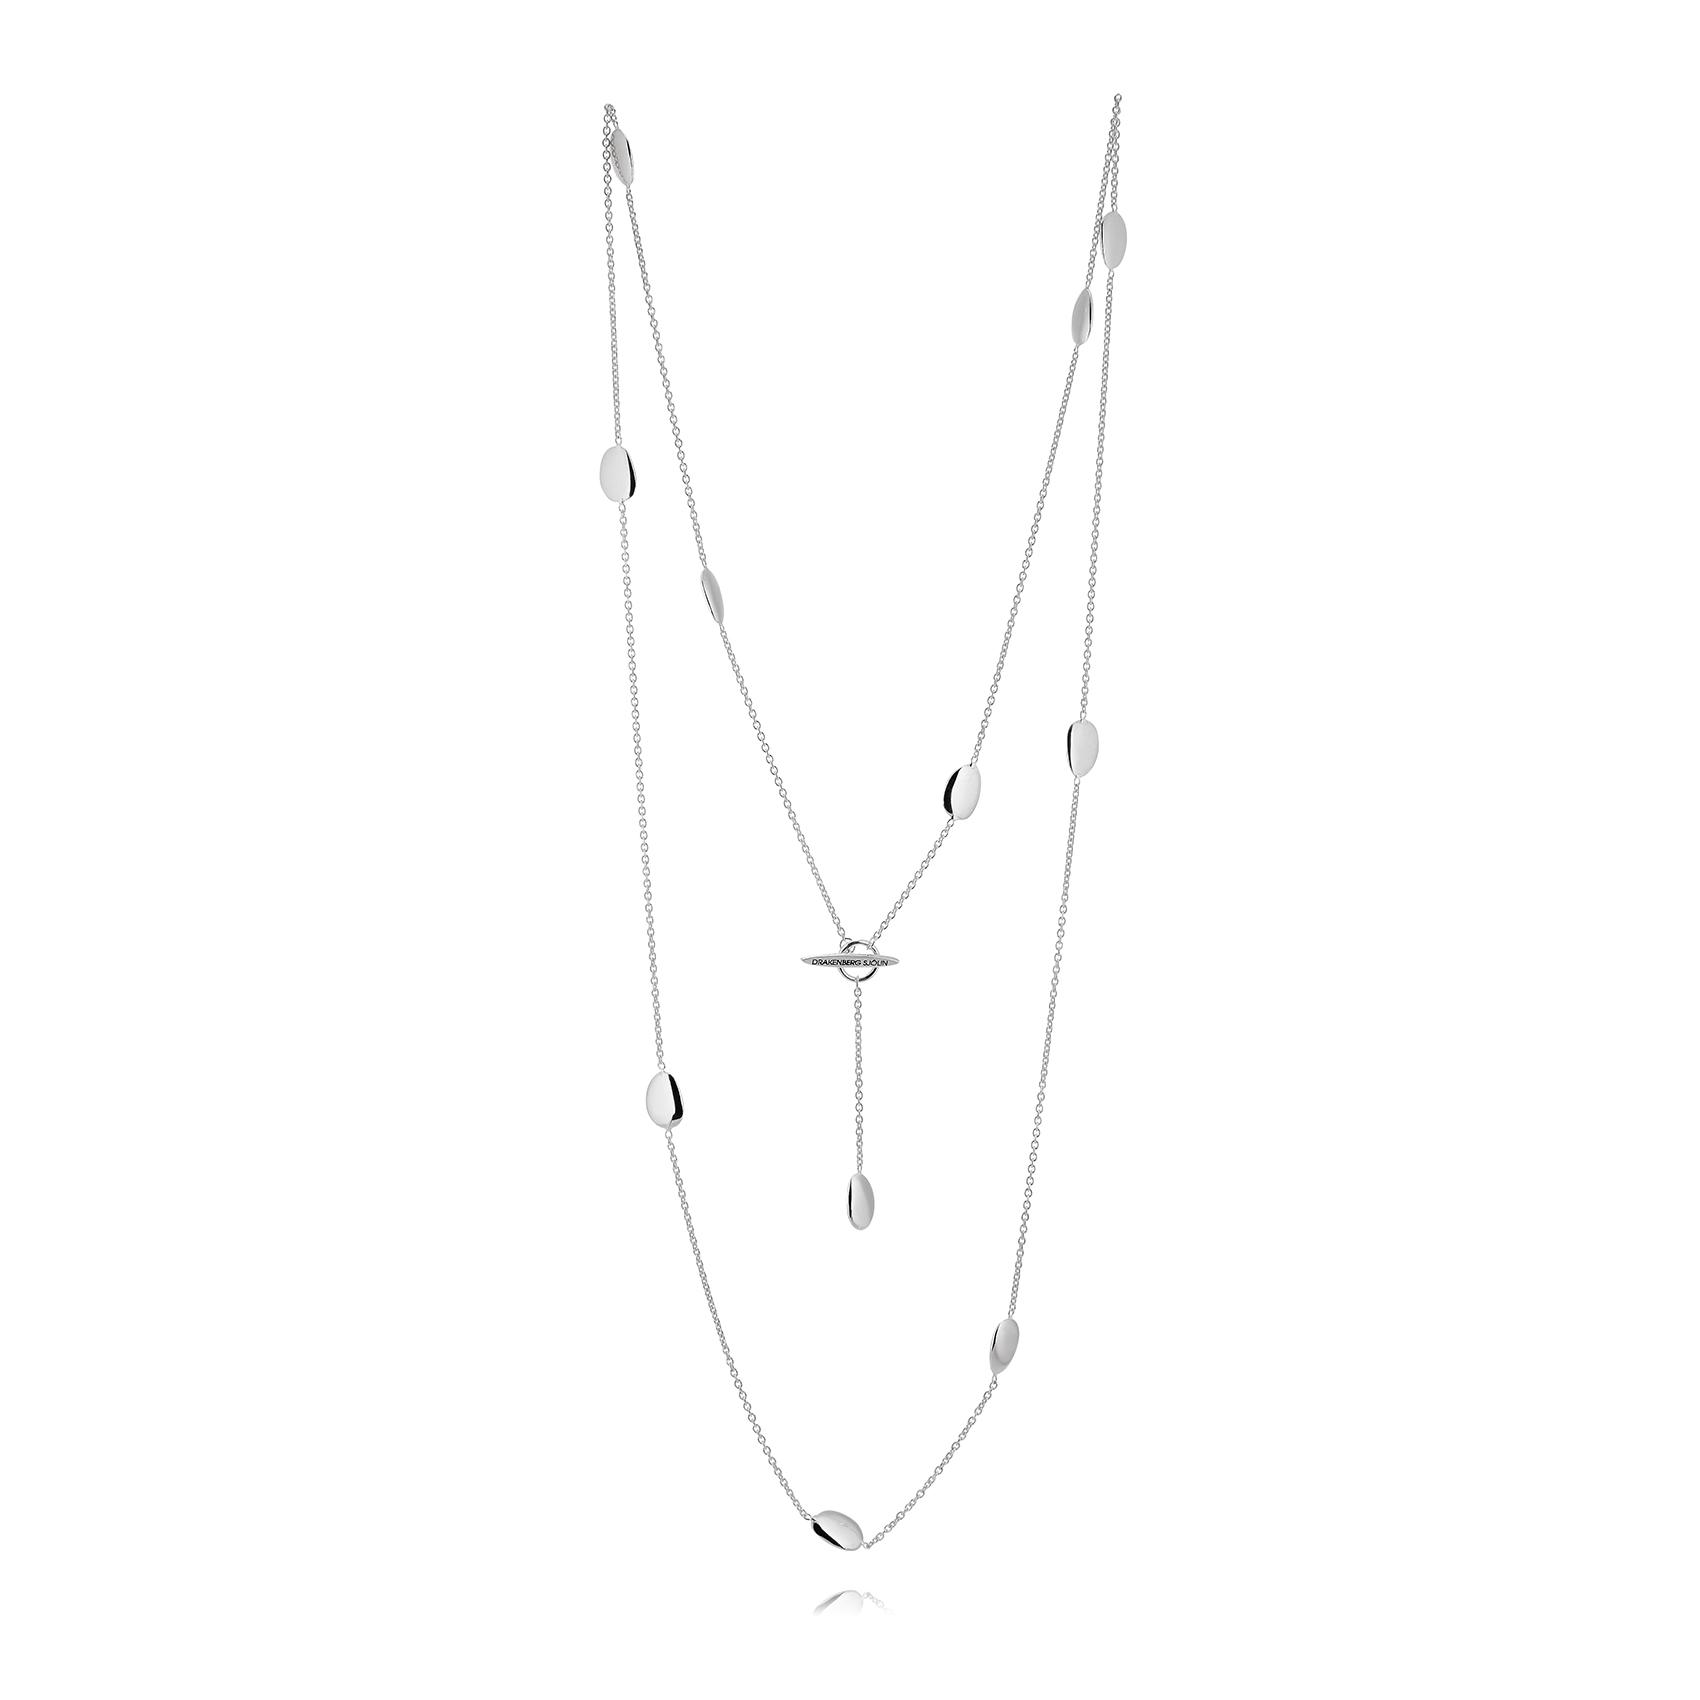 MorningDew Medium Necklace long-webb-chain